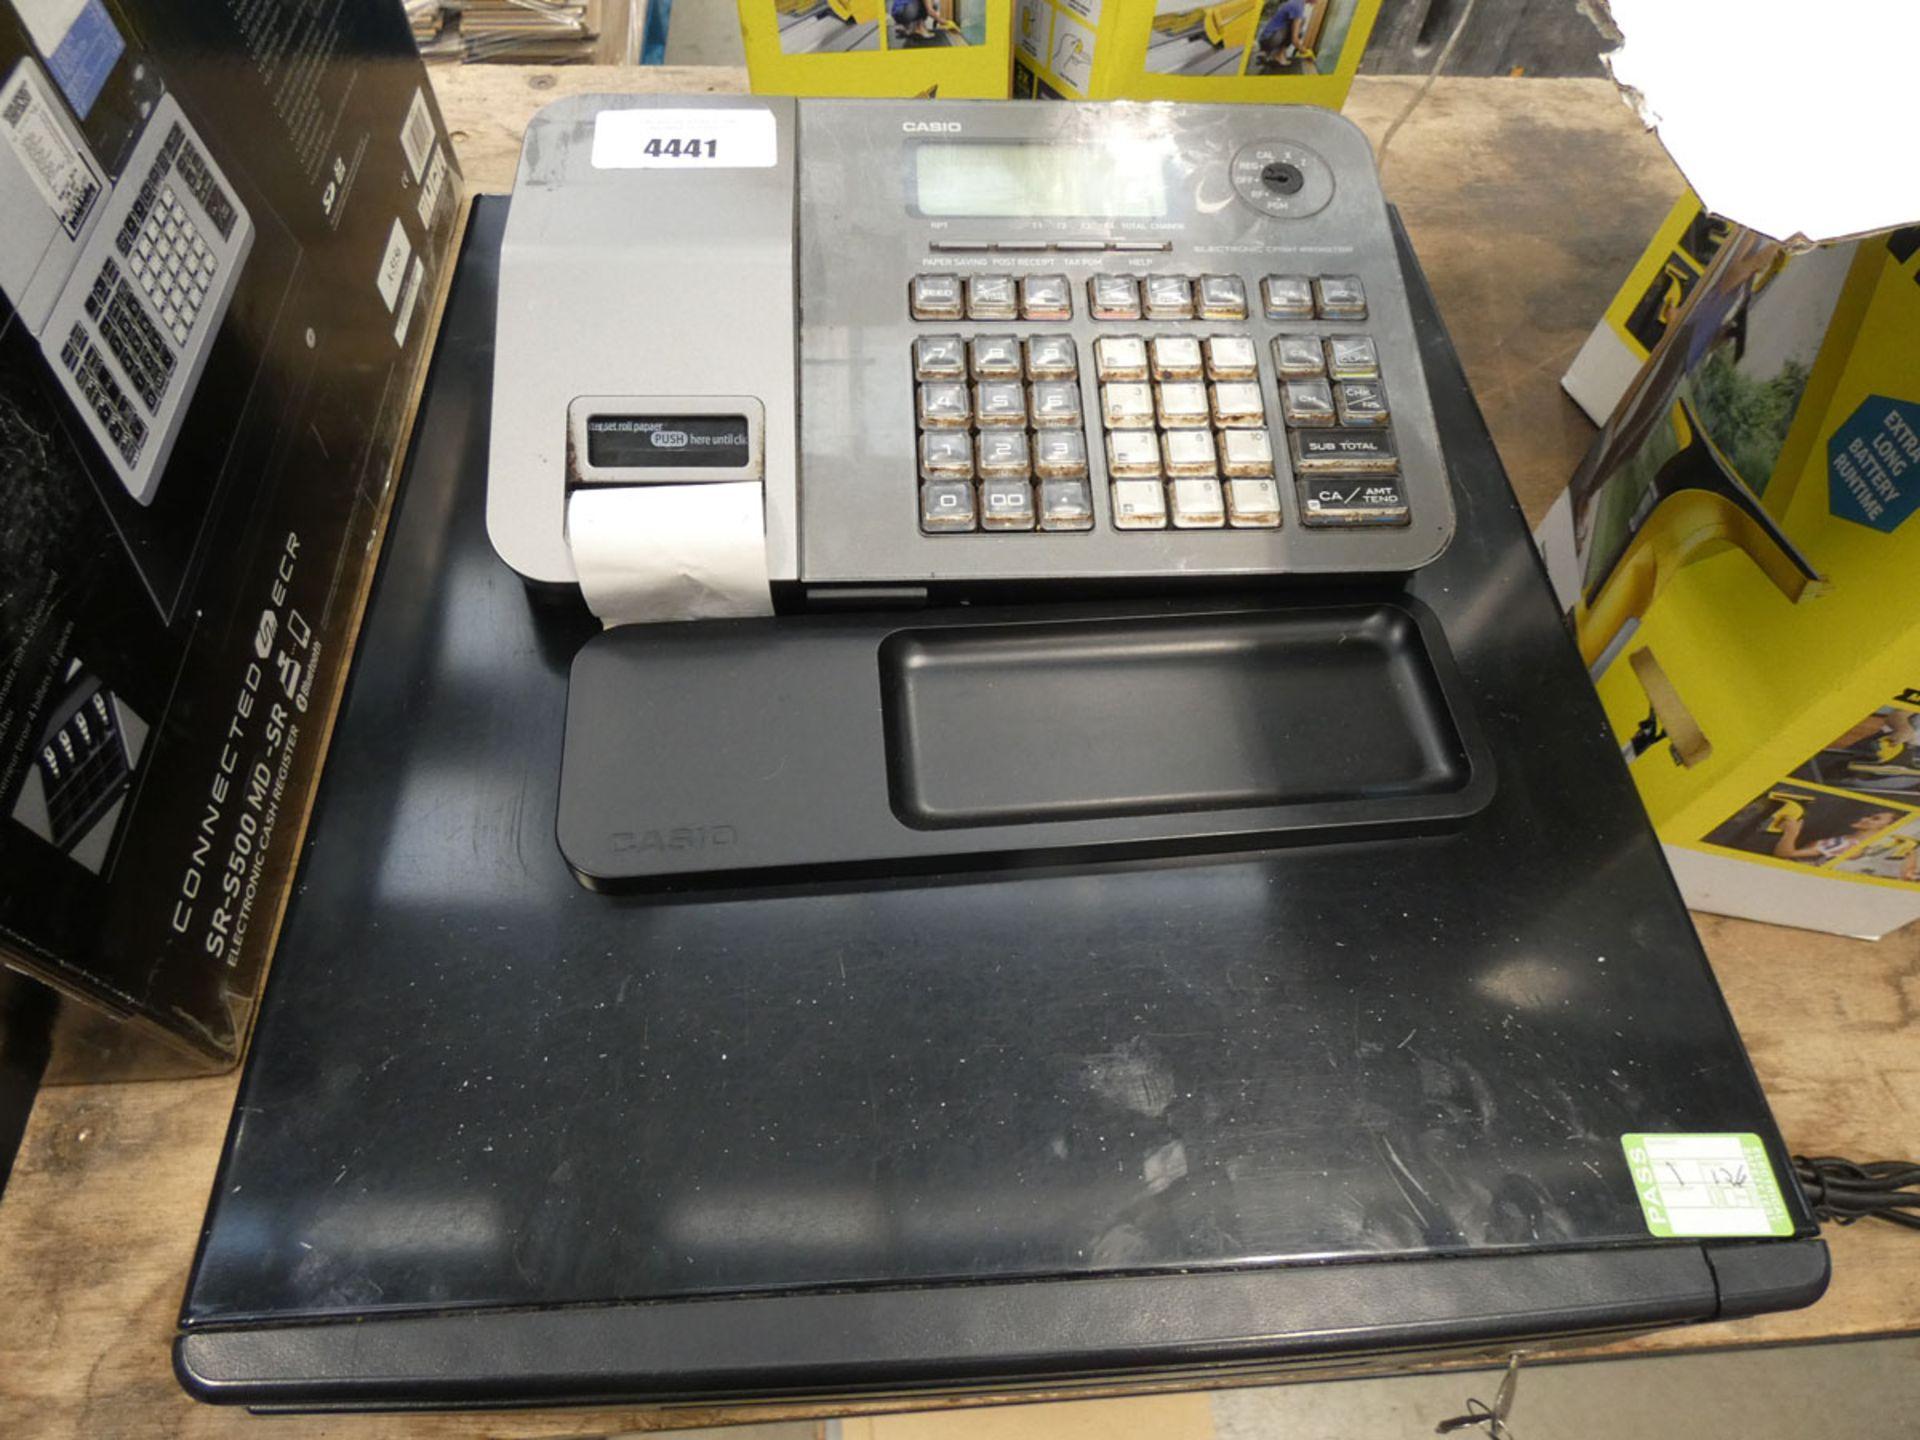 Unboxed Casio cash register Item lights us and has keys. Item is quite worn.